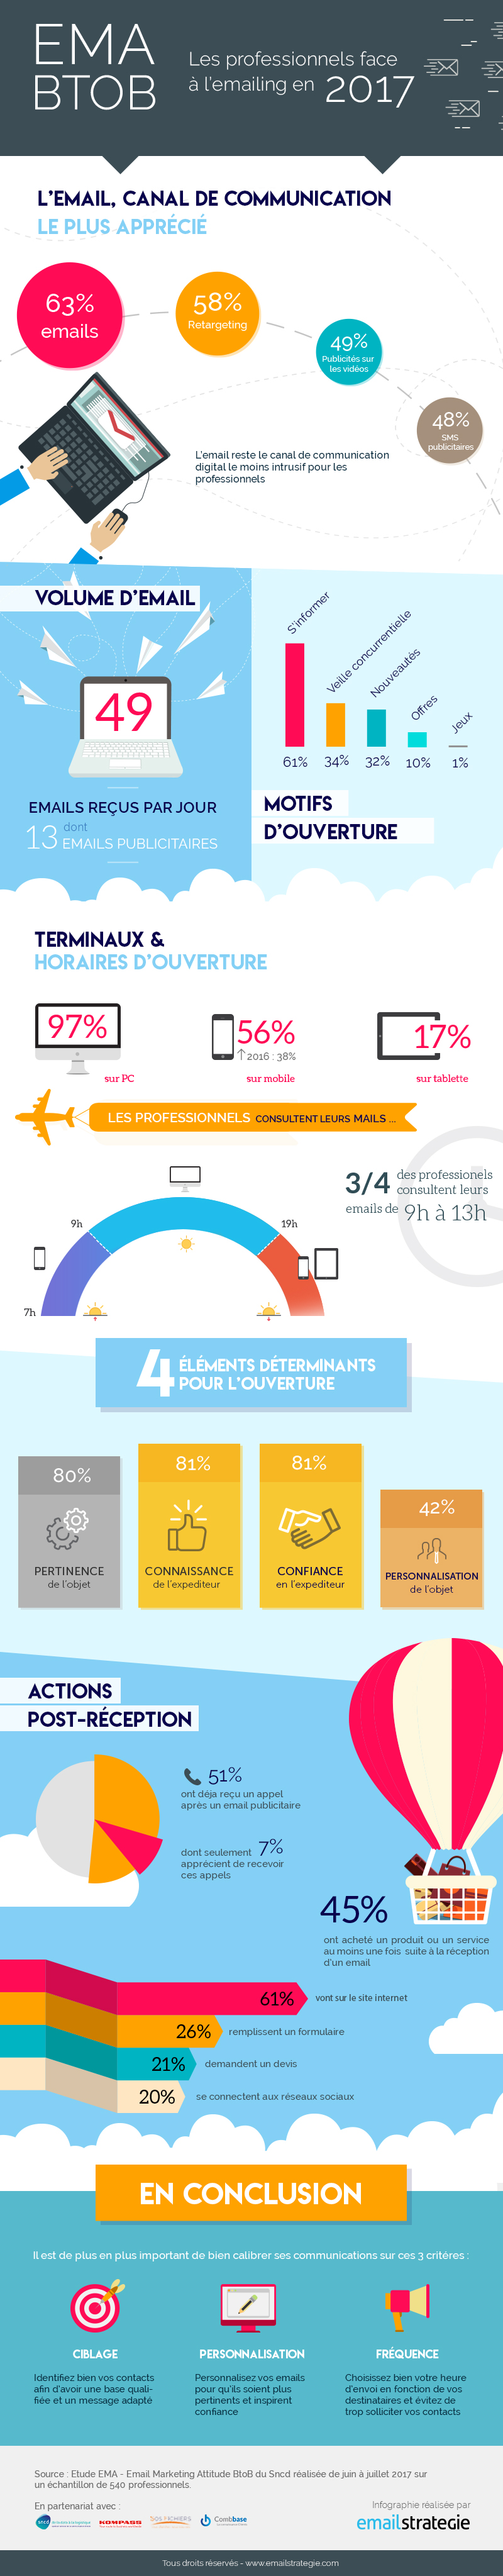 Infographie EMA B2B 2017